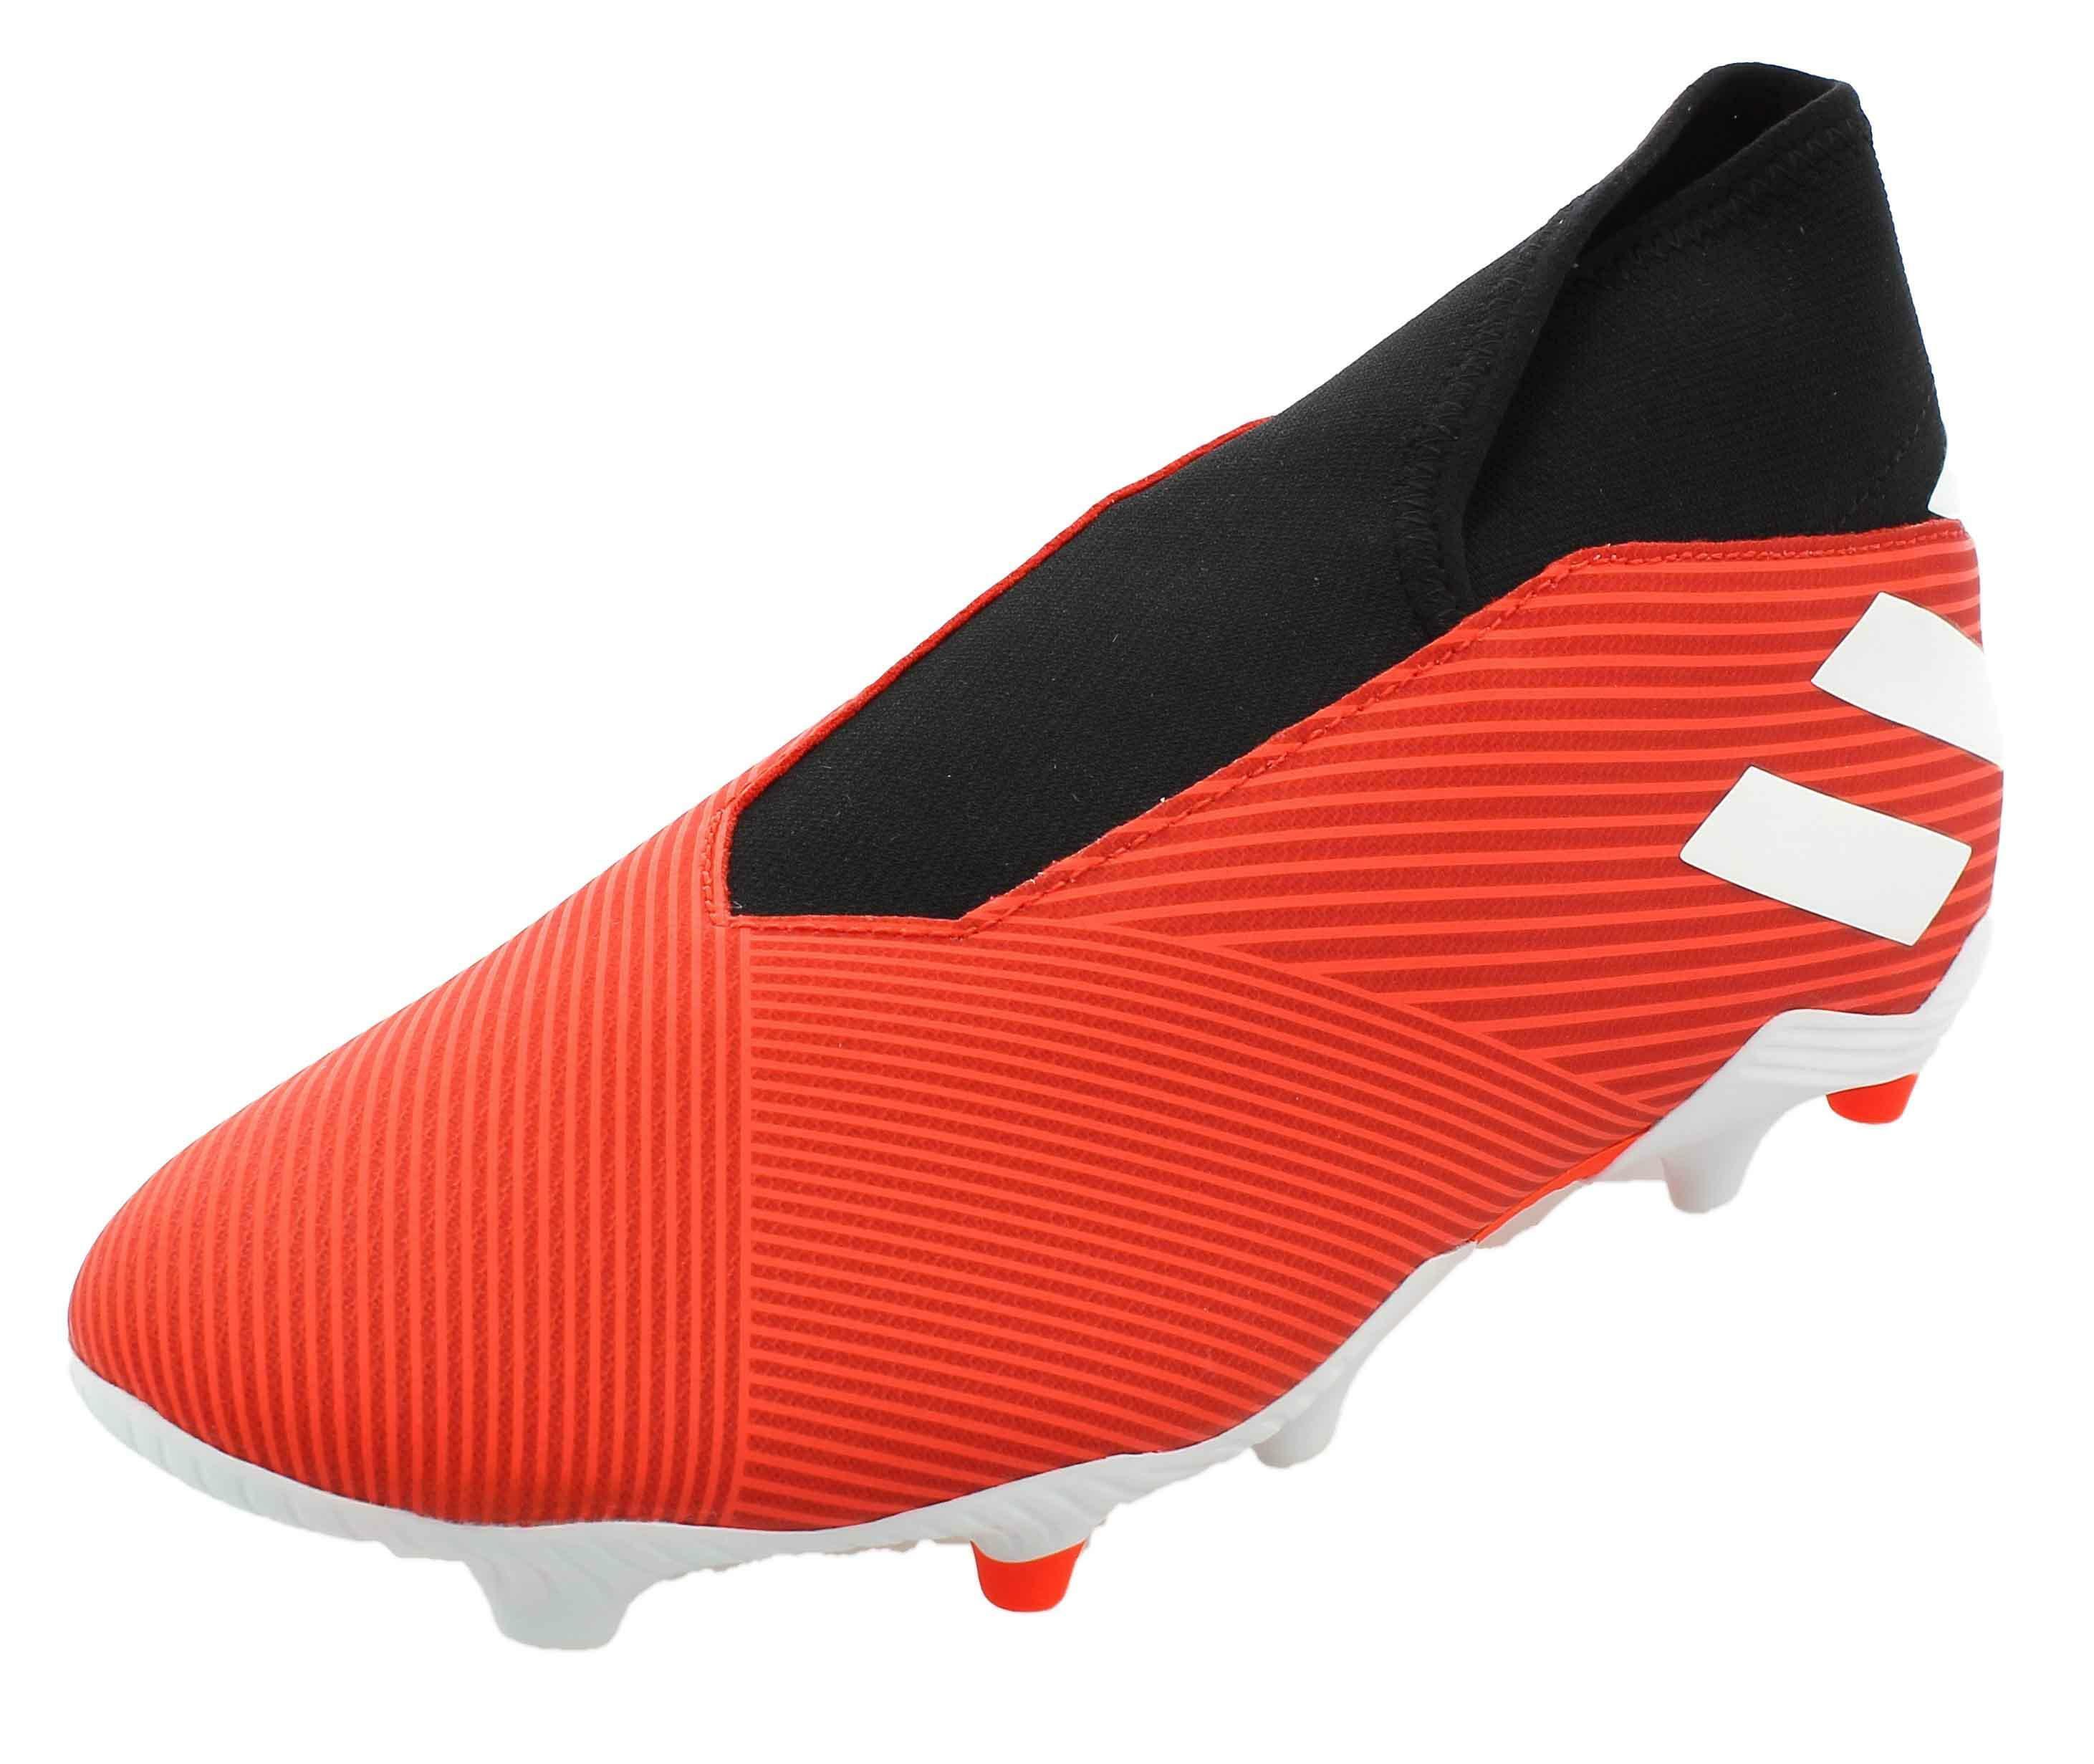 adidas nemeziz 19.3 ll fg scarpe calcio uomo rossi f99997